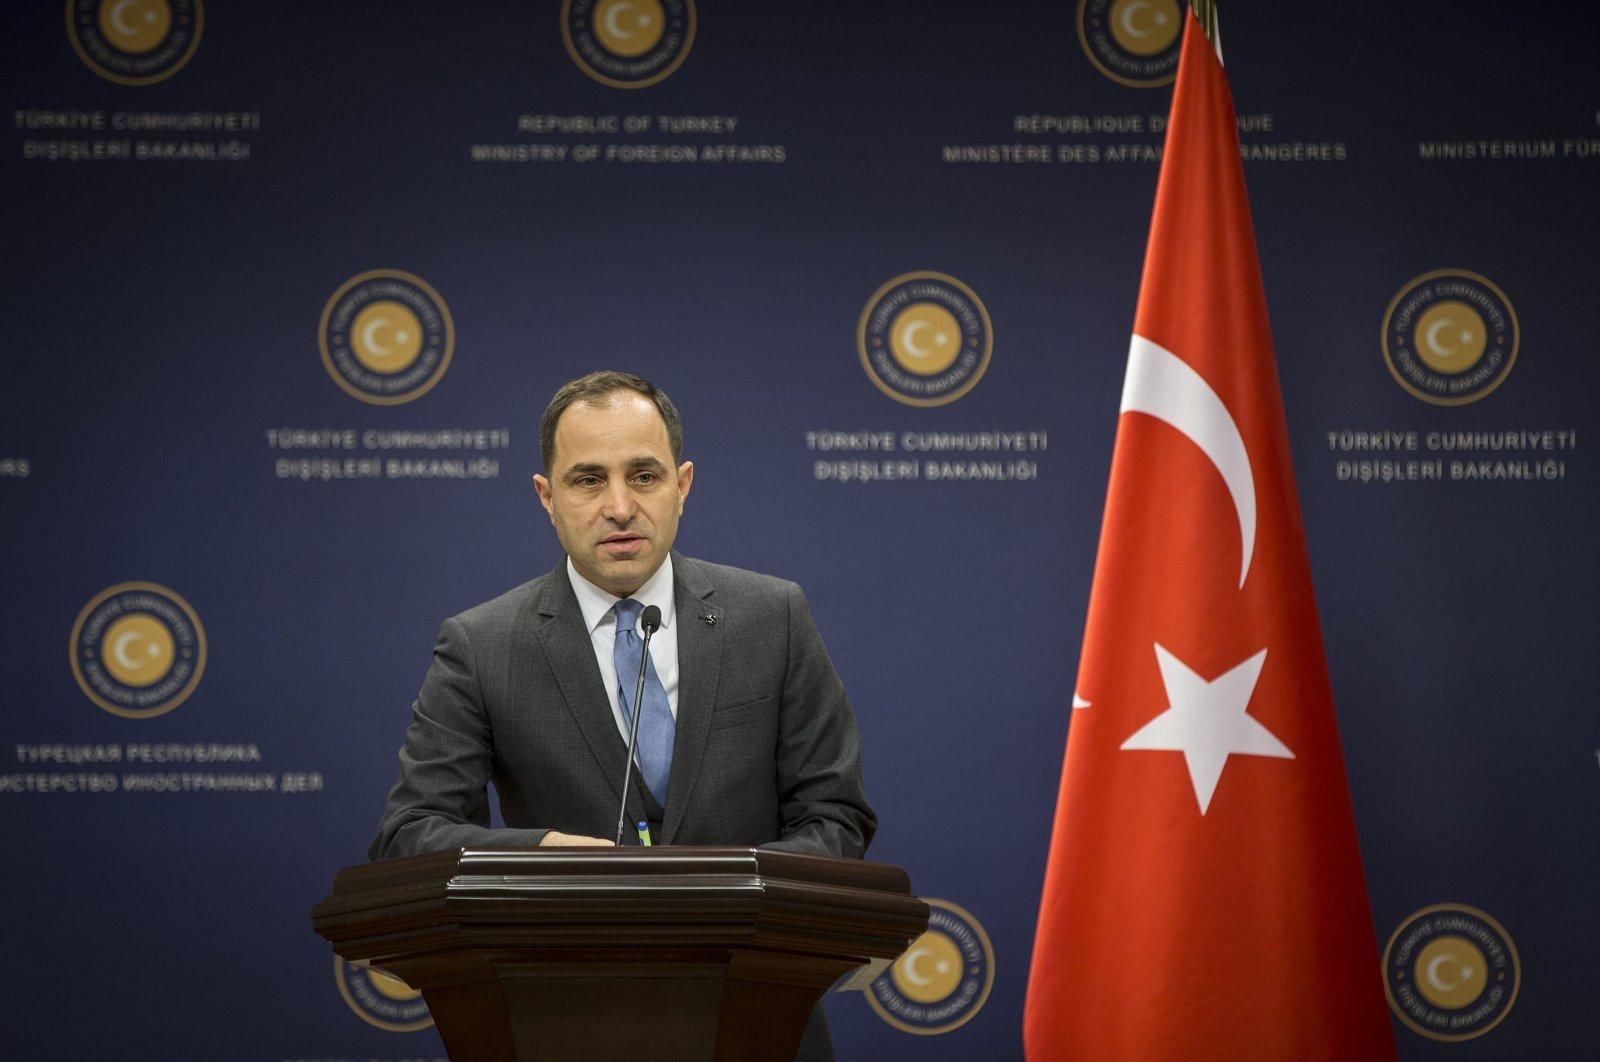 Foreign Ministry spokesperson Tanju Bilgiç speaks at a news conference in Ankara, Turkey. (AA File Photo)